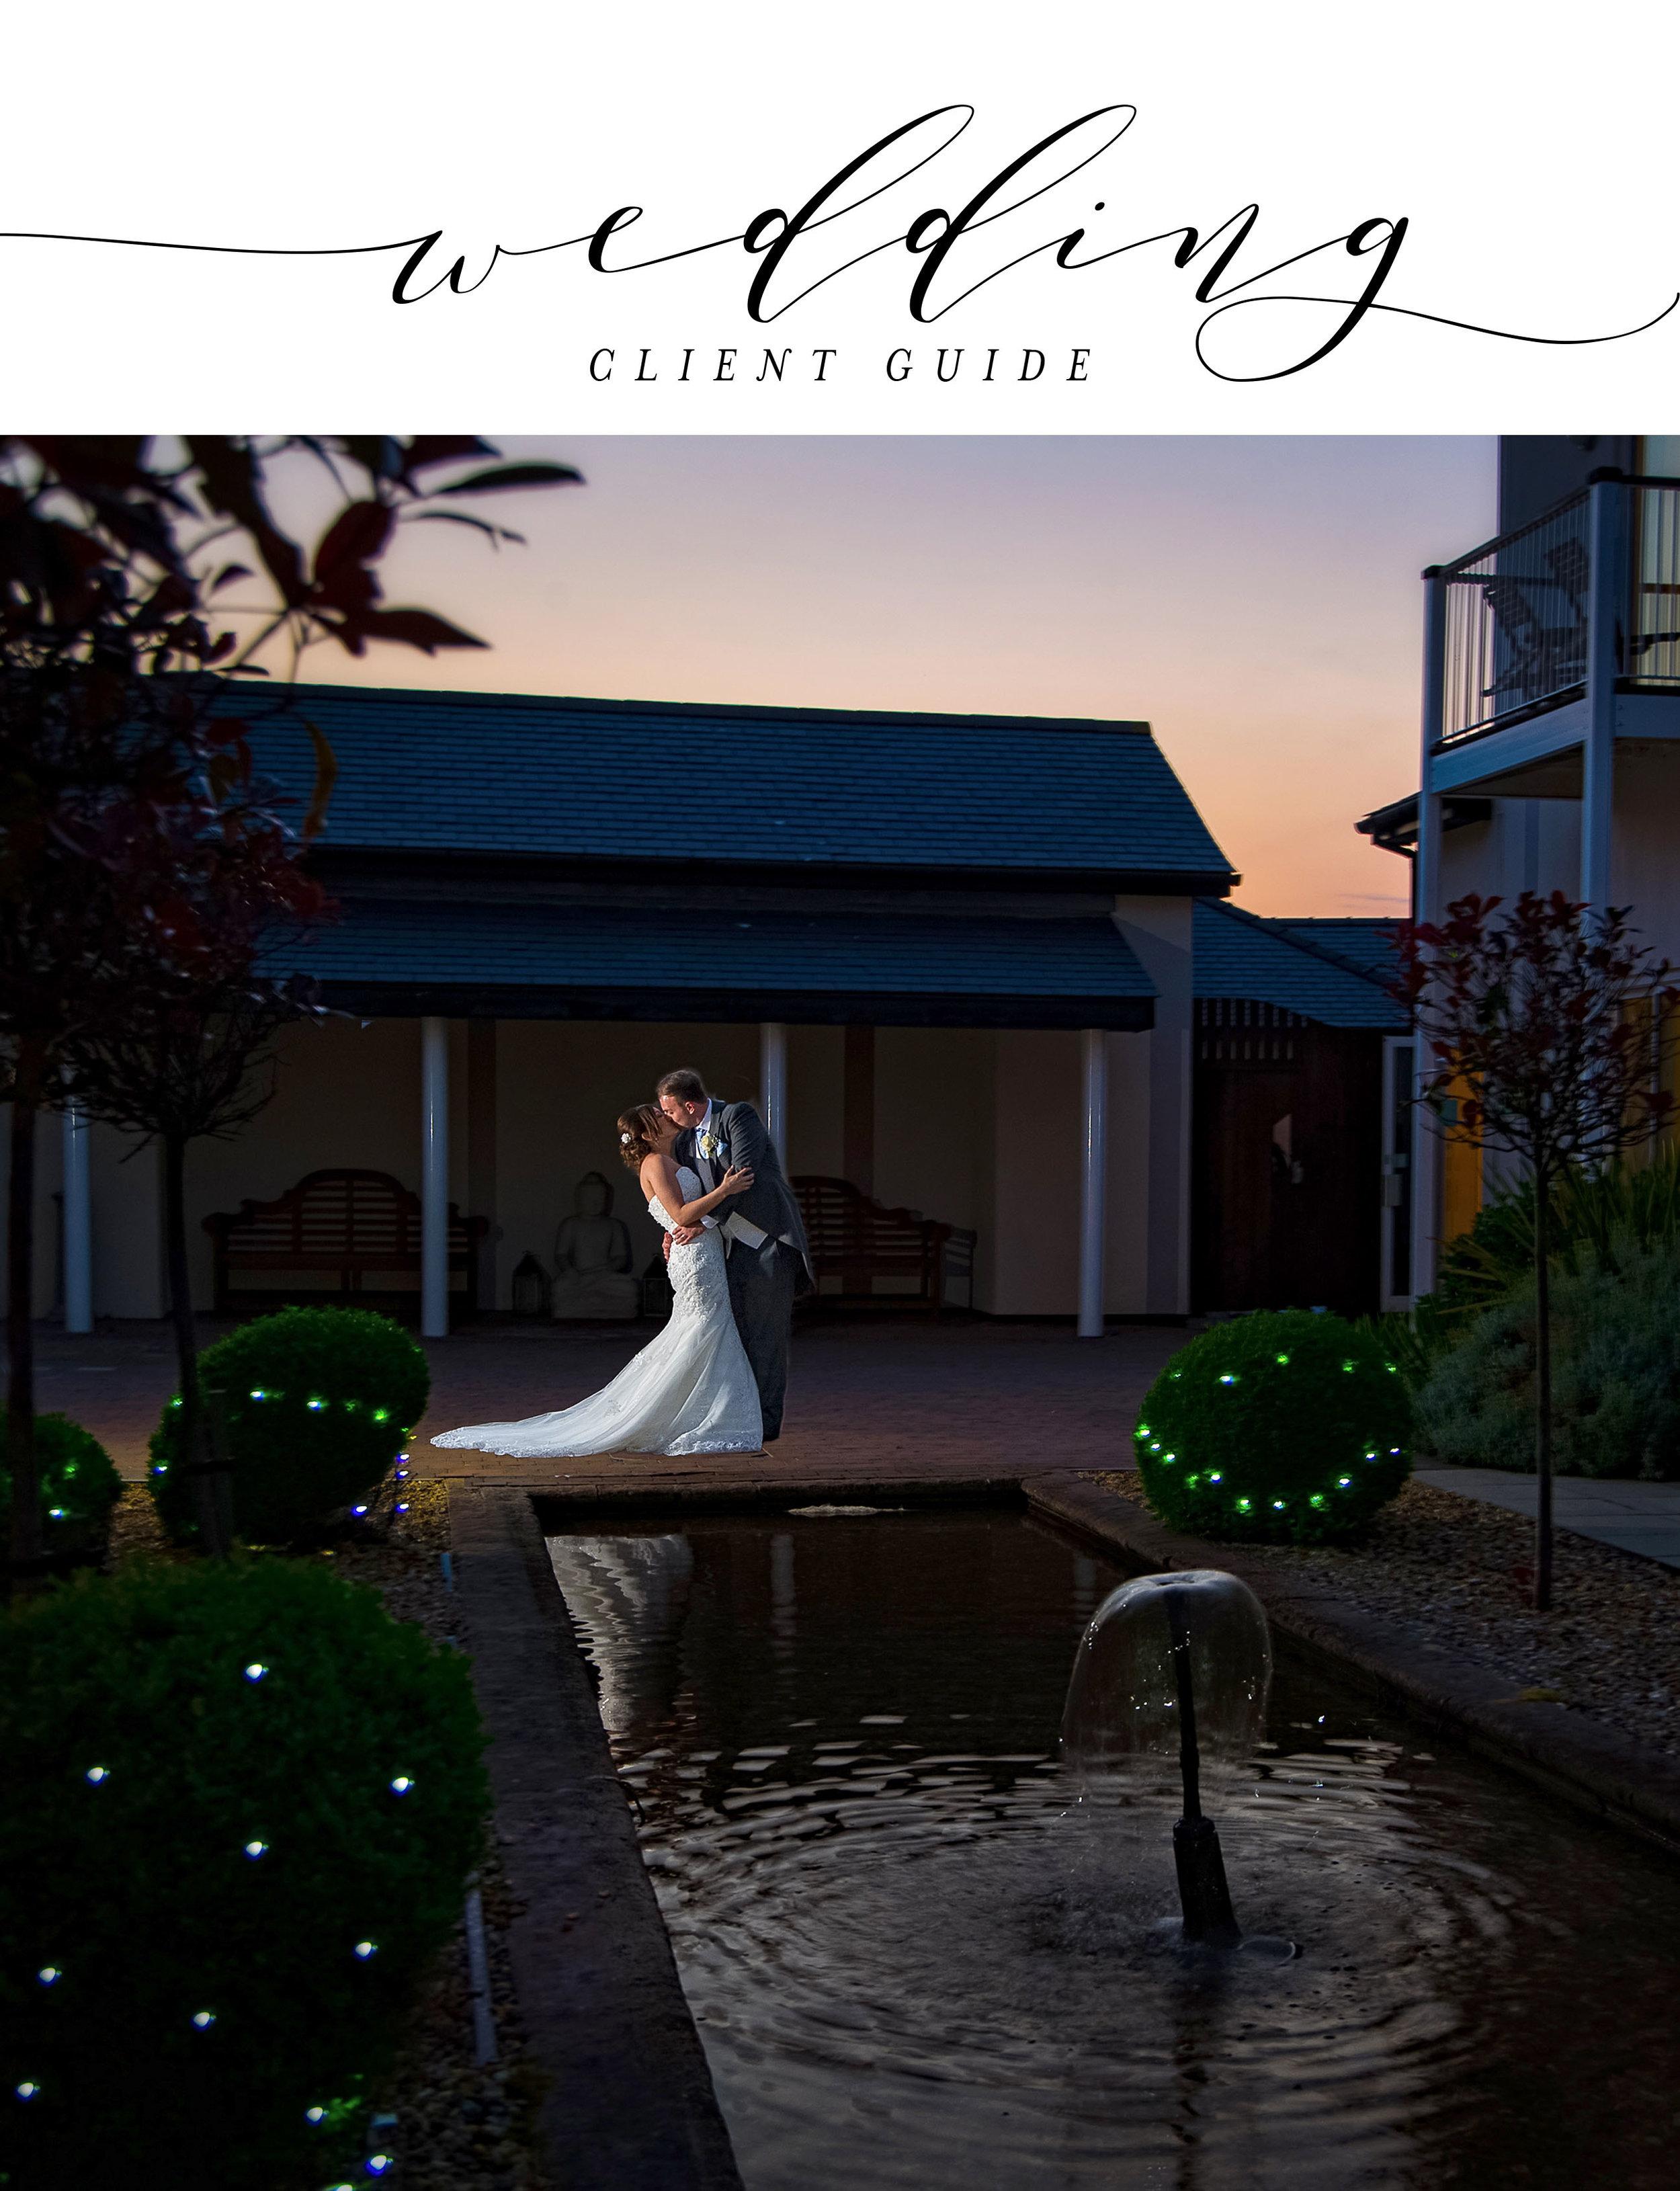 1 - BP4U - Wedding Client Guide - Cover.jpg